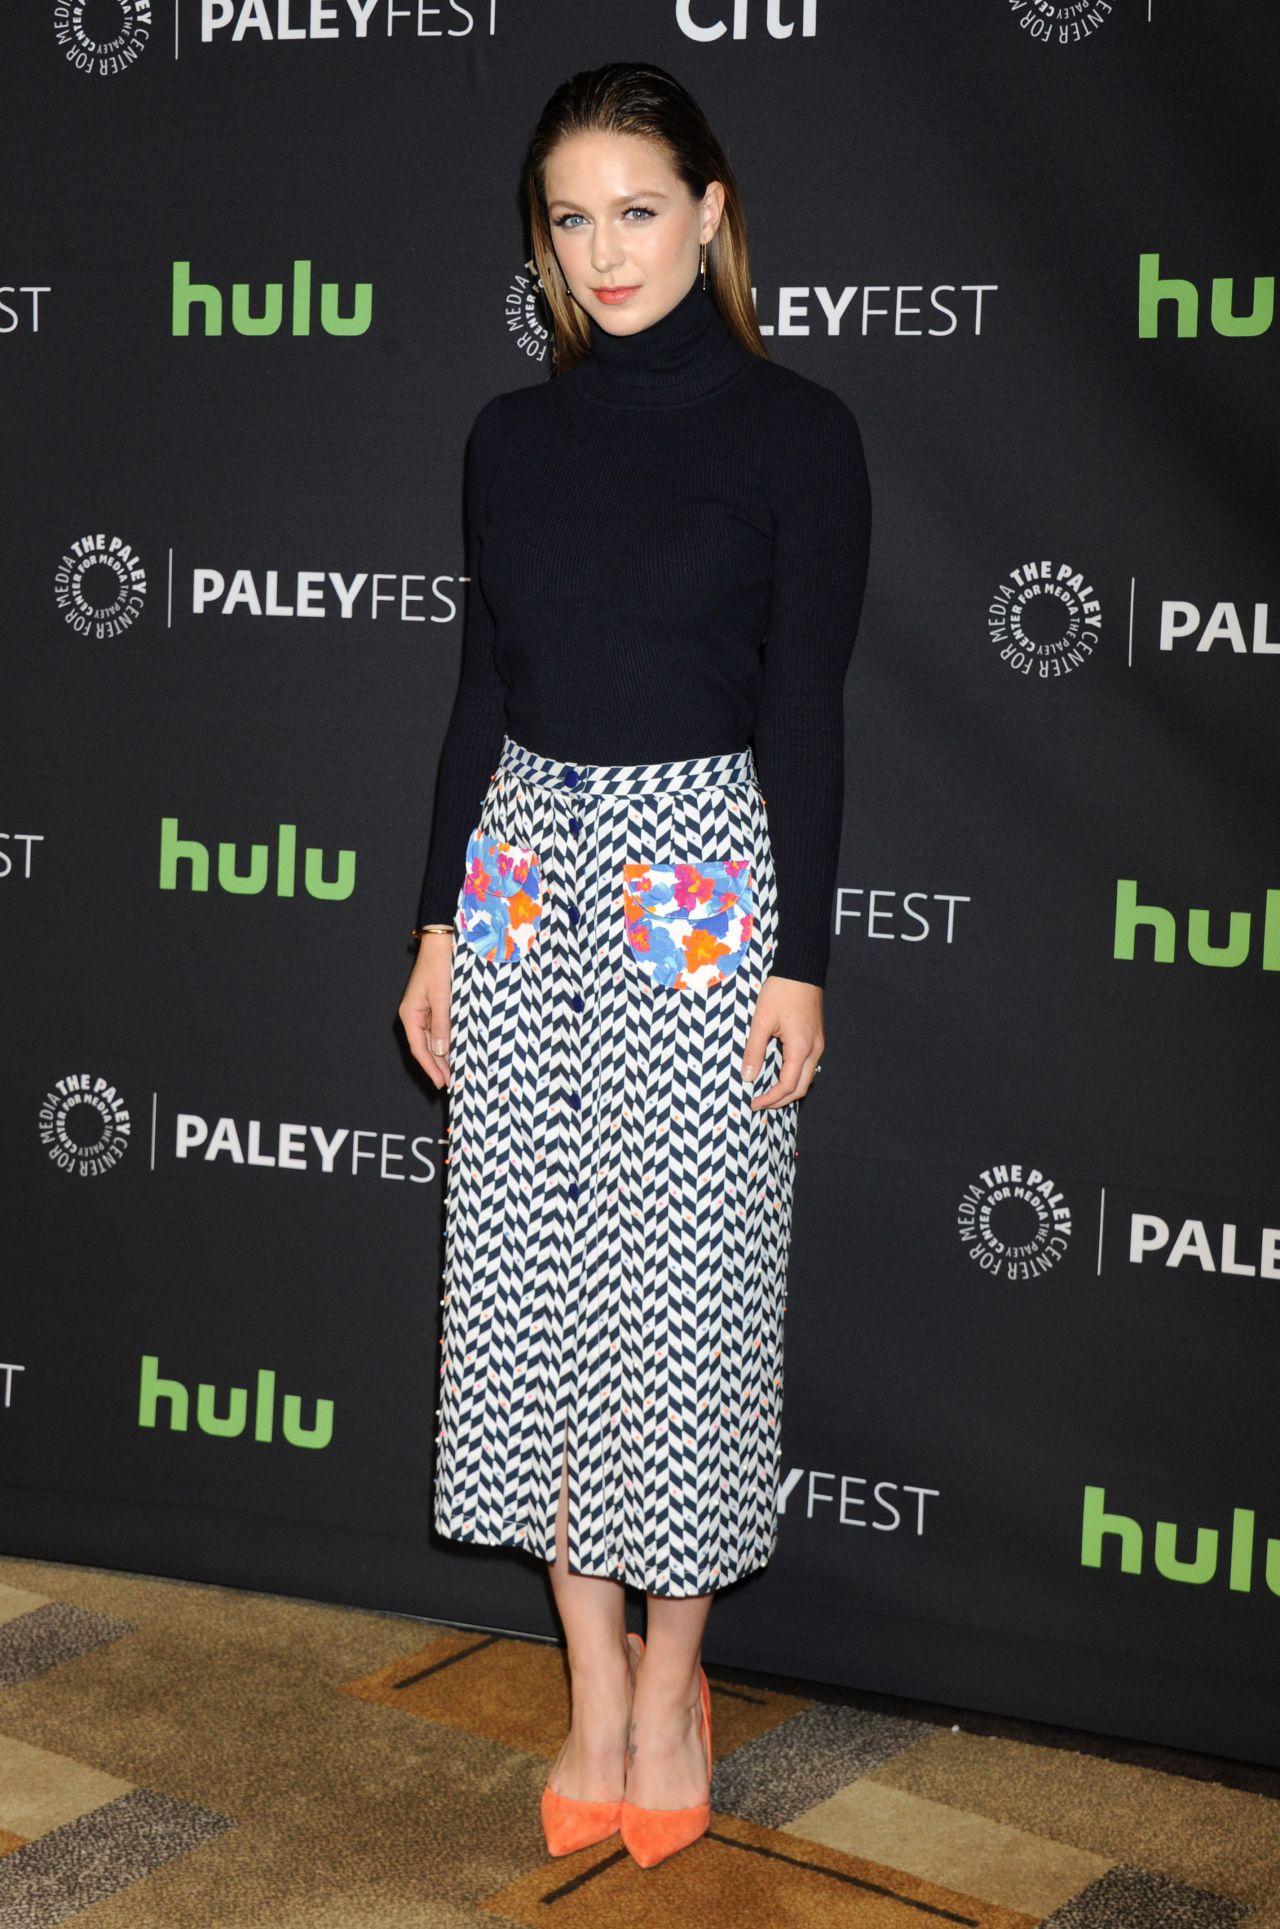 Melissa Benoist Supergirl At 2016 Media Paleyfest Los